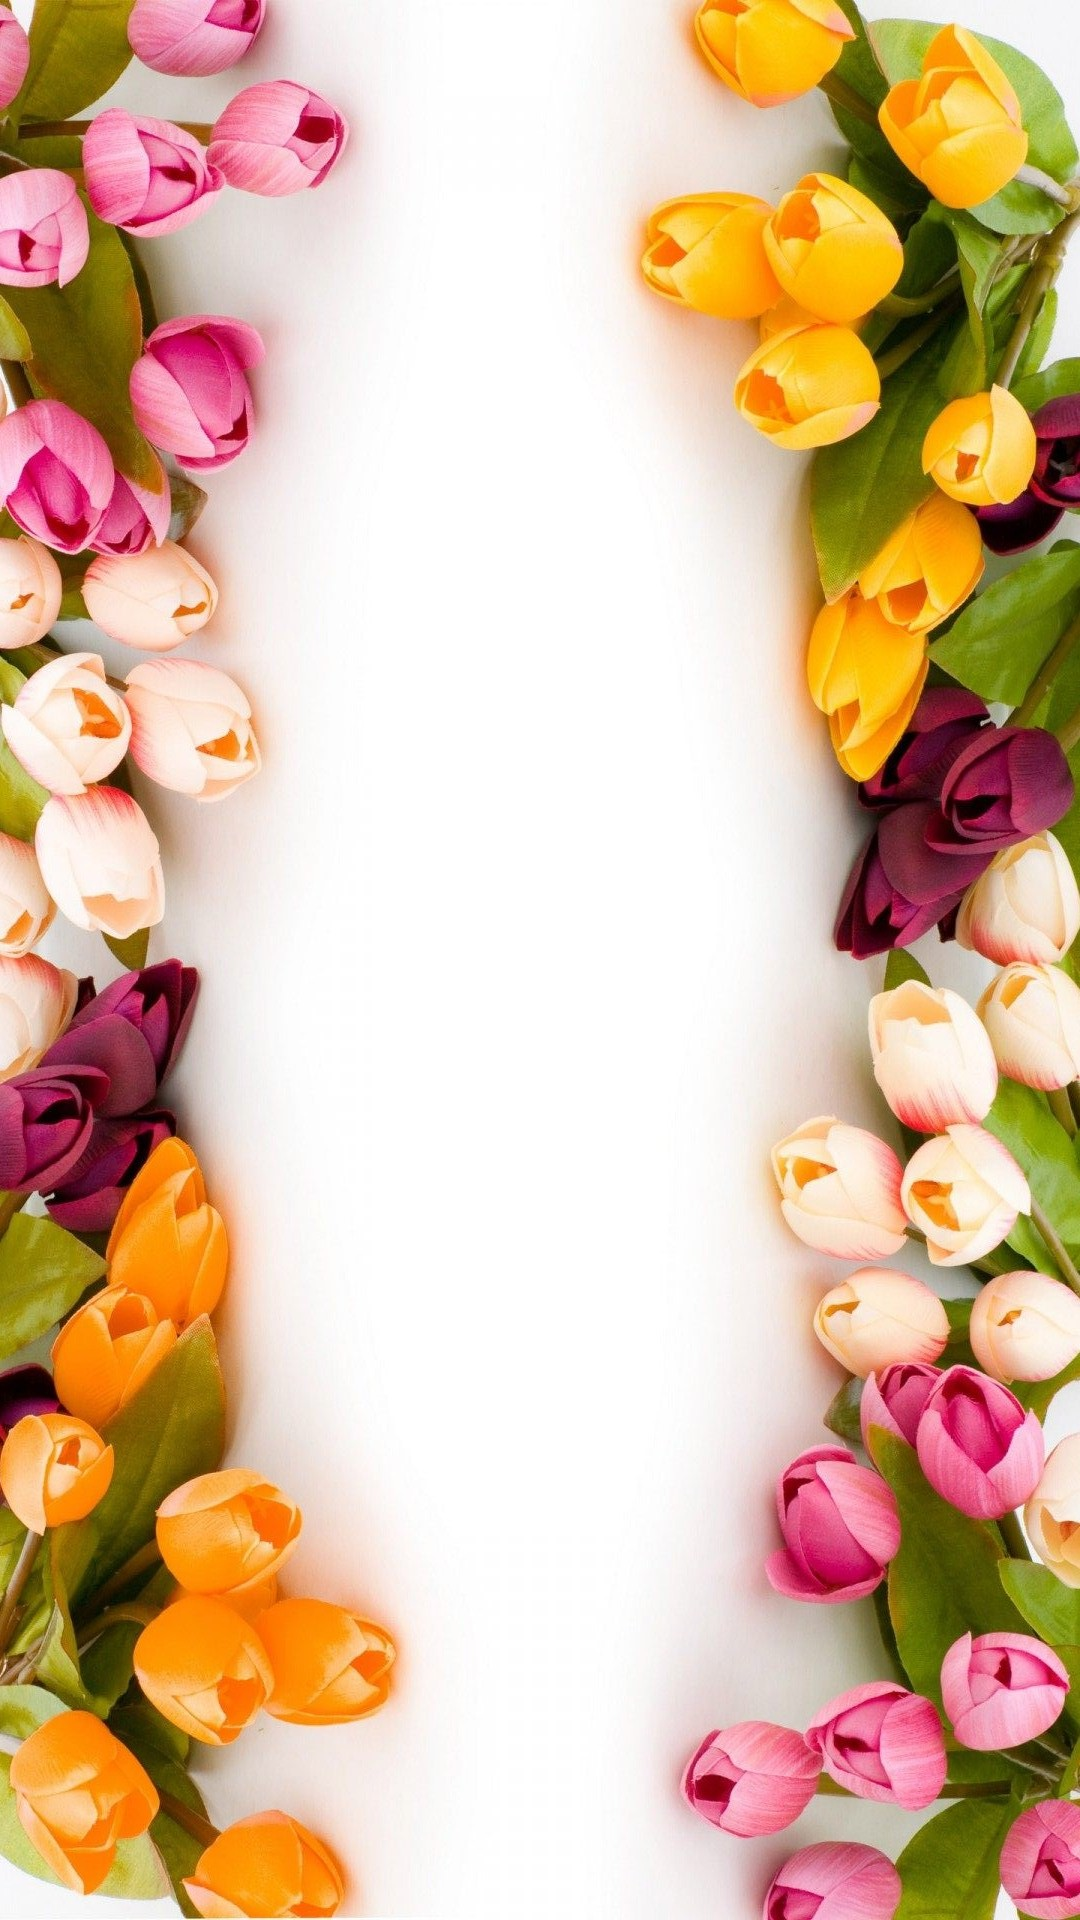 Tulip Flowers Wallpaper Iphone 2020 3d Iphone Wallpaper